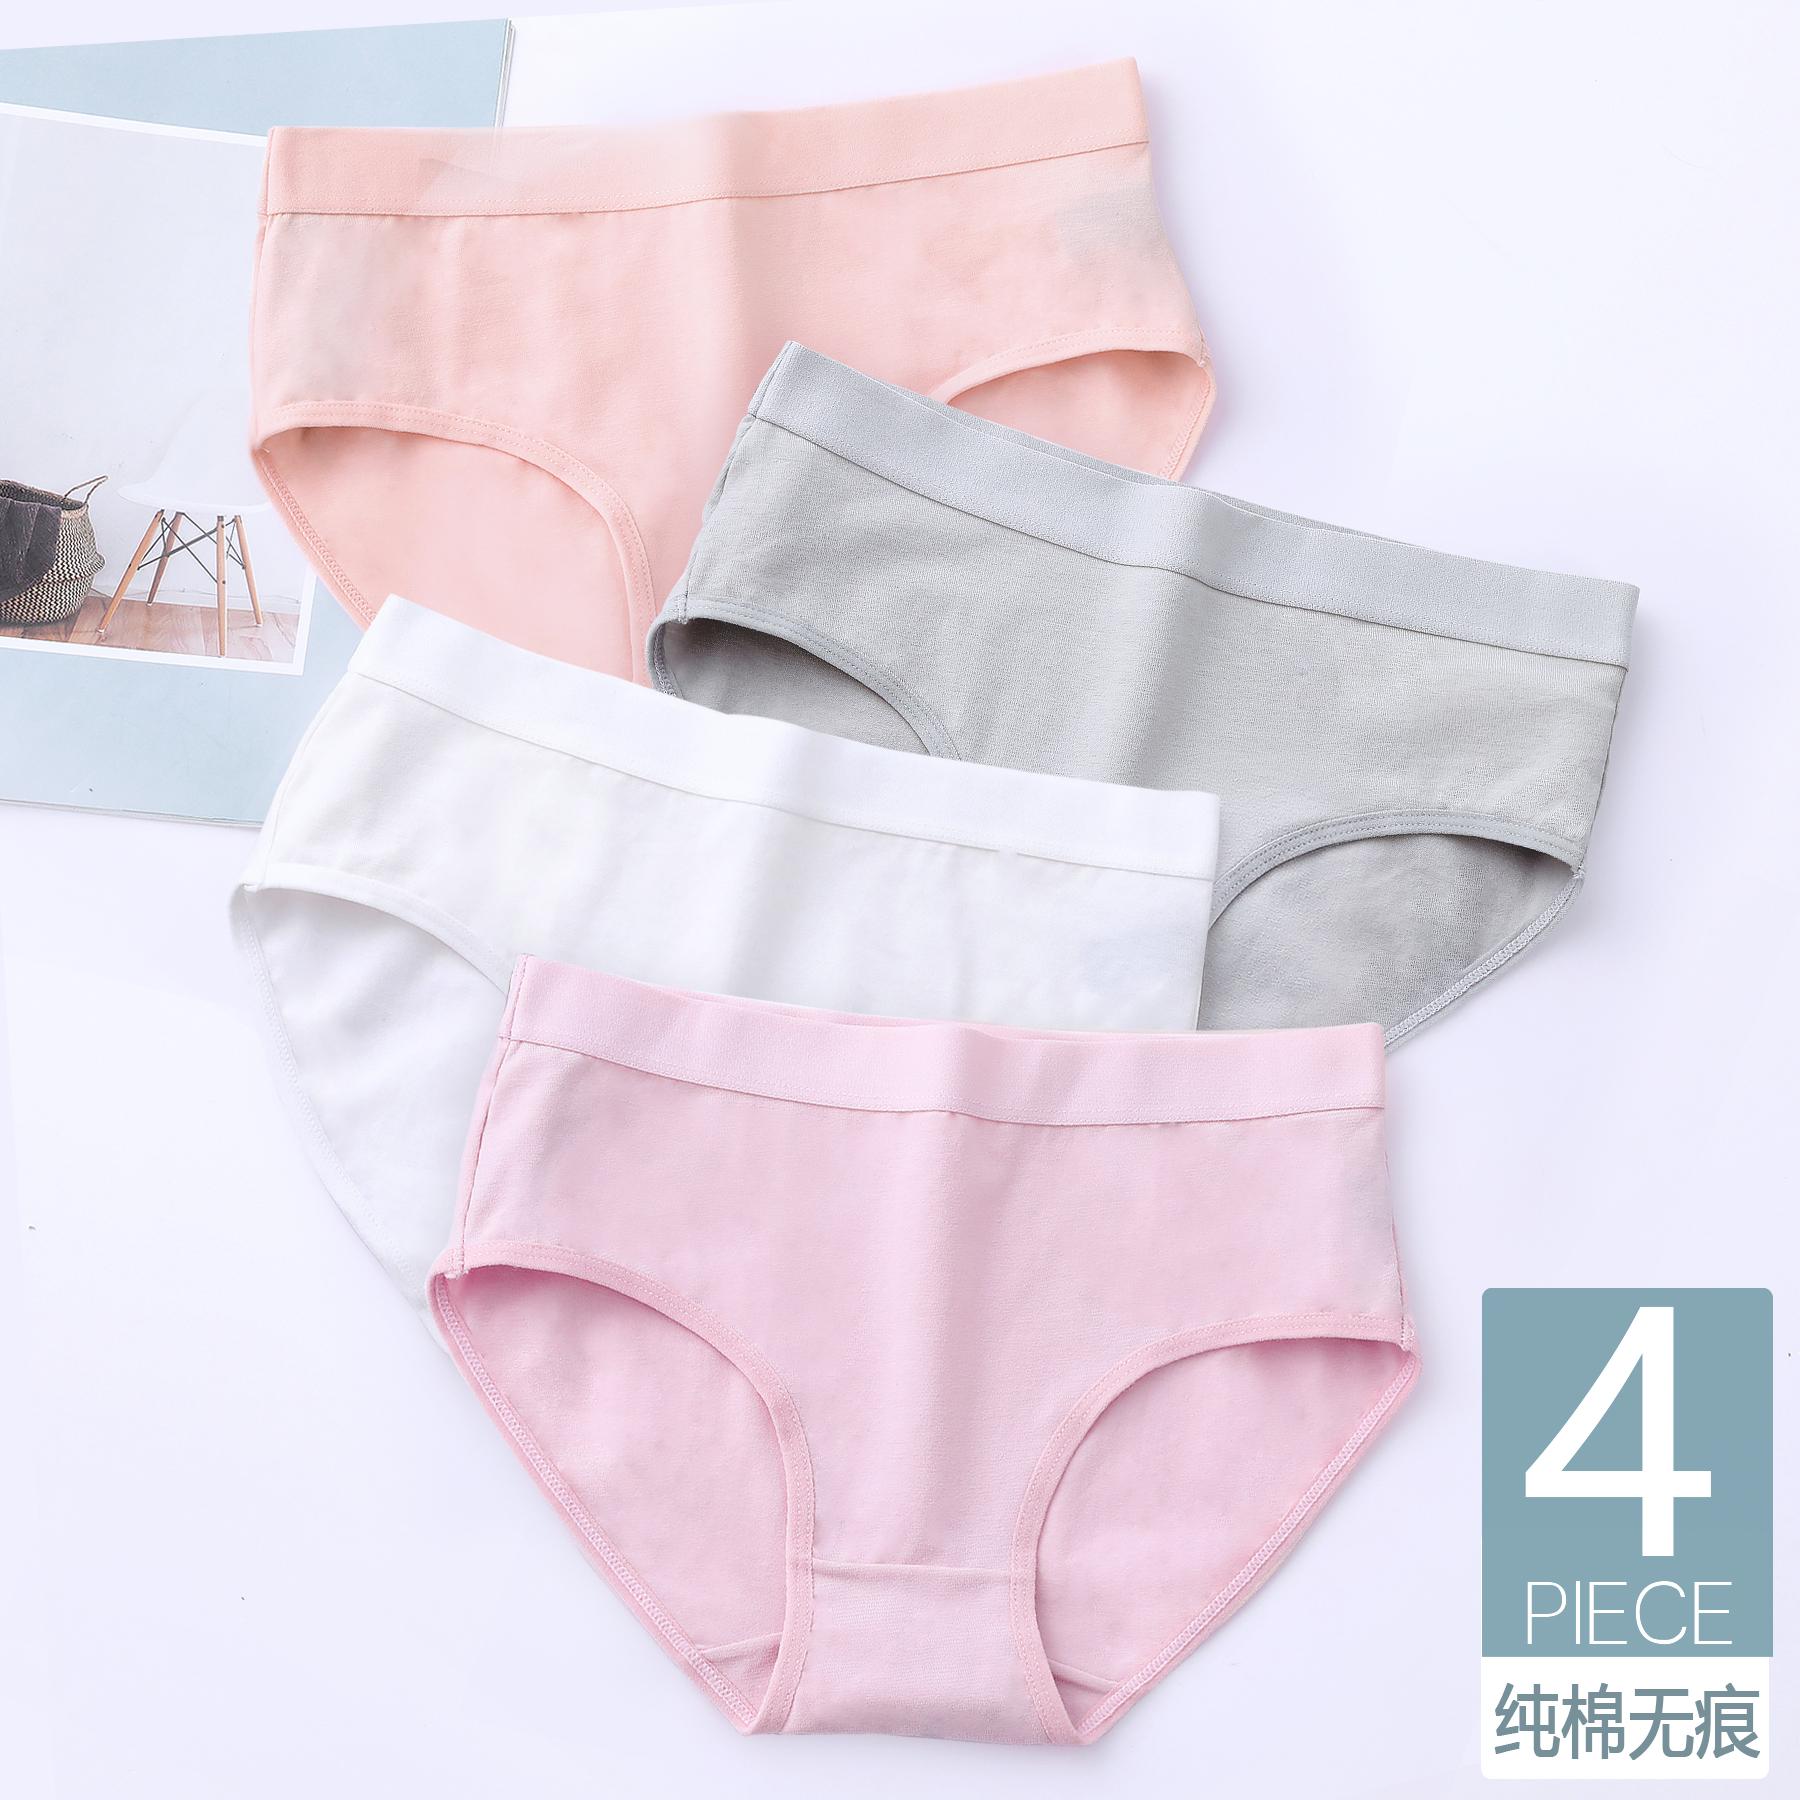 2018 new seamless underwear womens cotton mid waist 100% cotton womens antibacterial girl Japanese students briefs